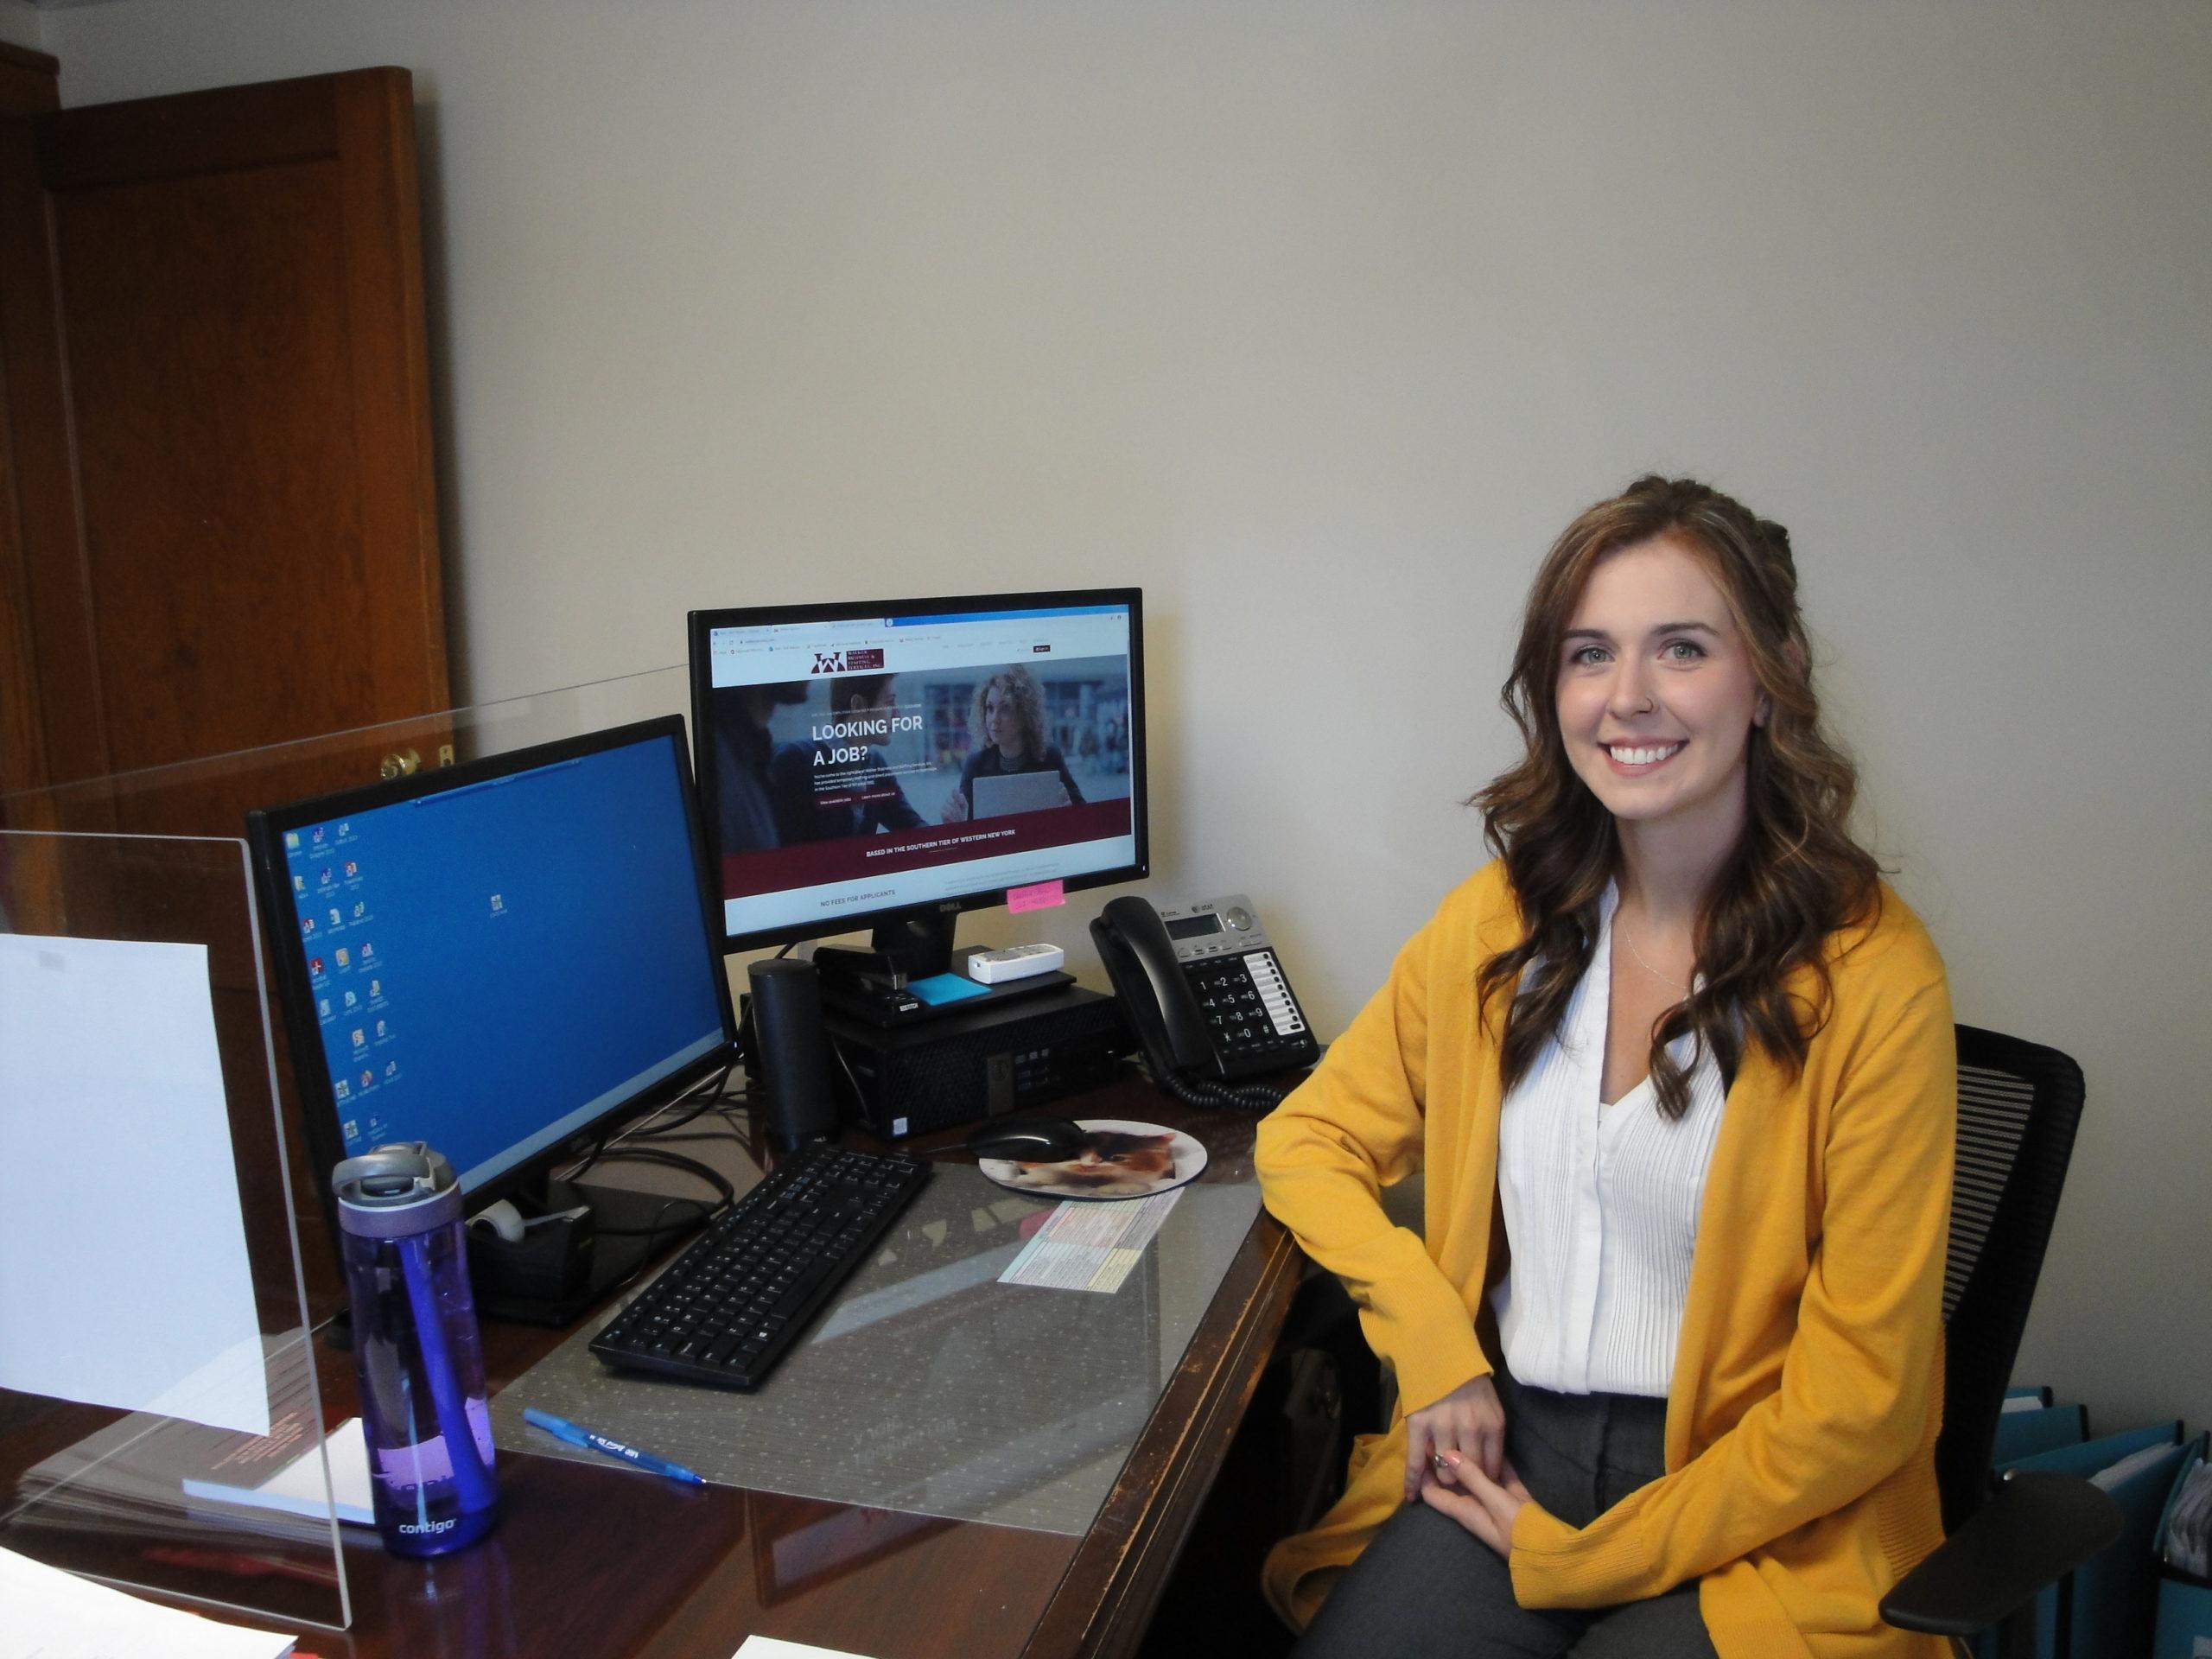 A picture of our recruiter, Britt Reid